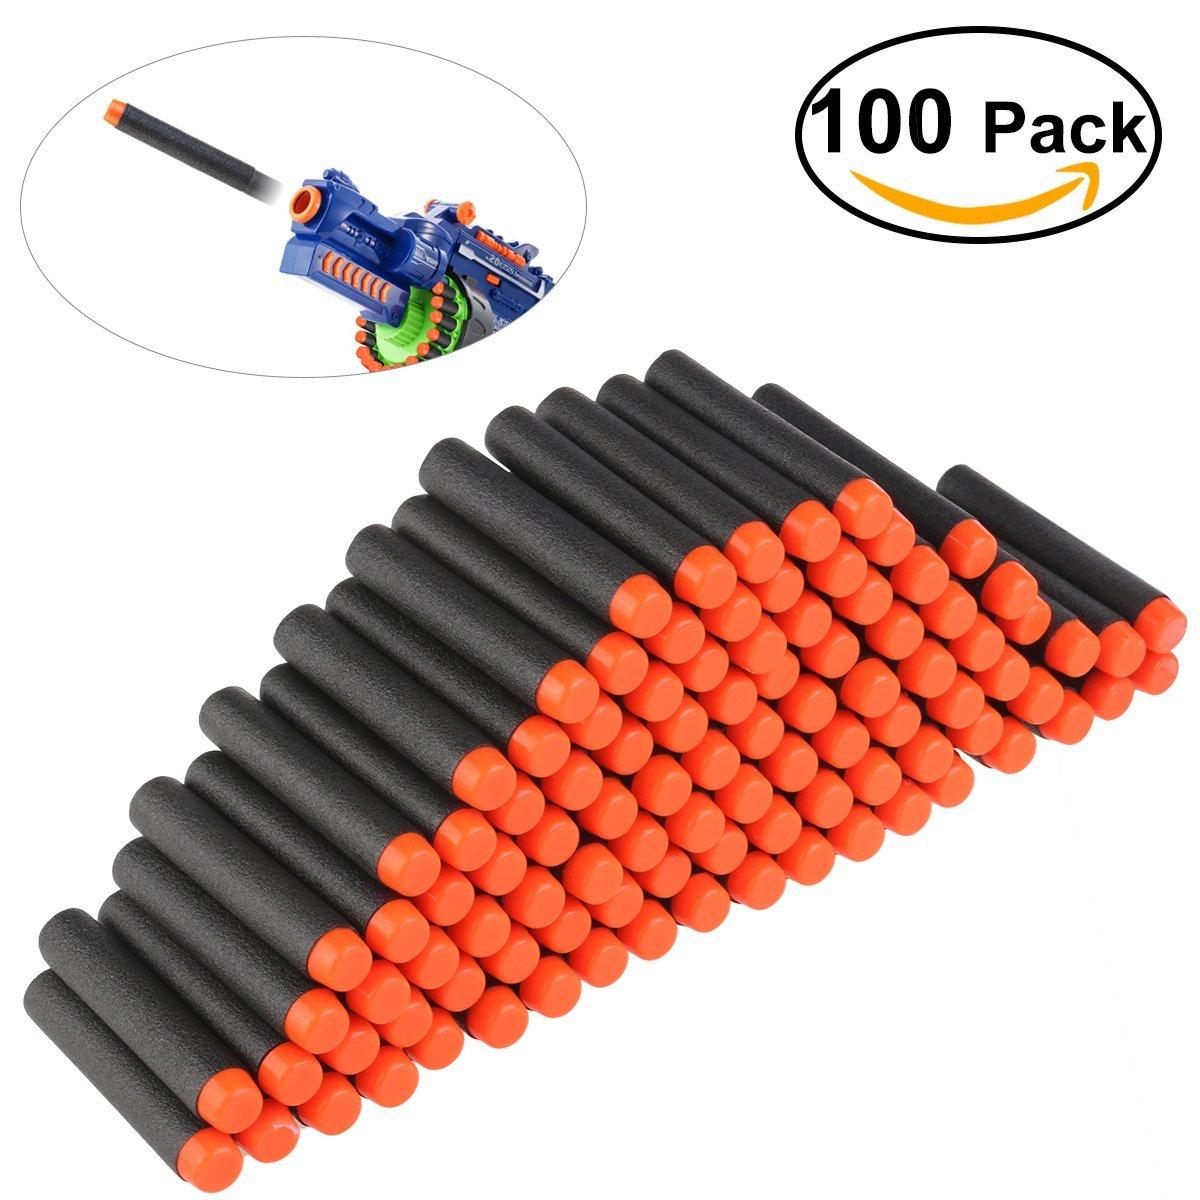 NUOLUX Foam Darts 100pcs 7.2cm for Nerf N-strike Elite Series Blasters Toy Gun Color Black